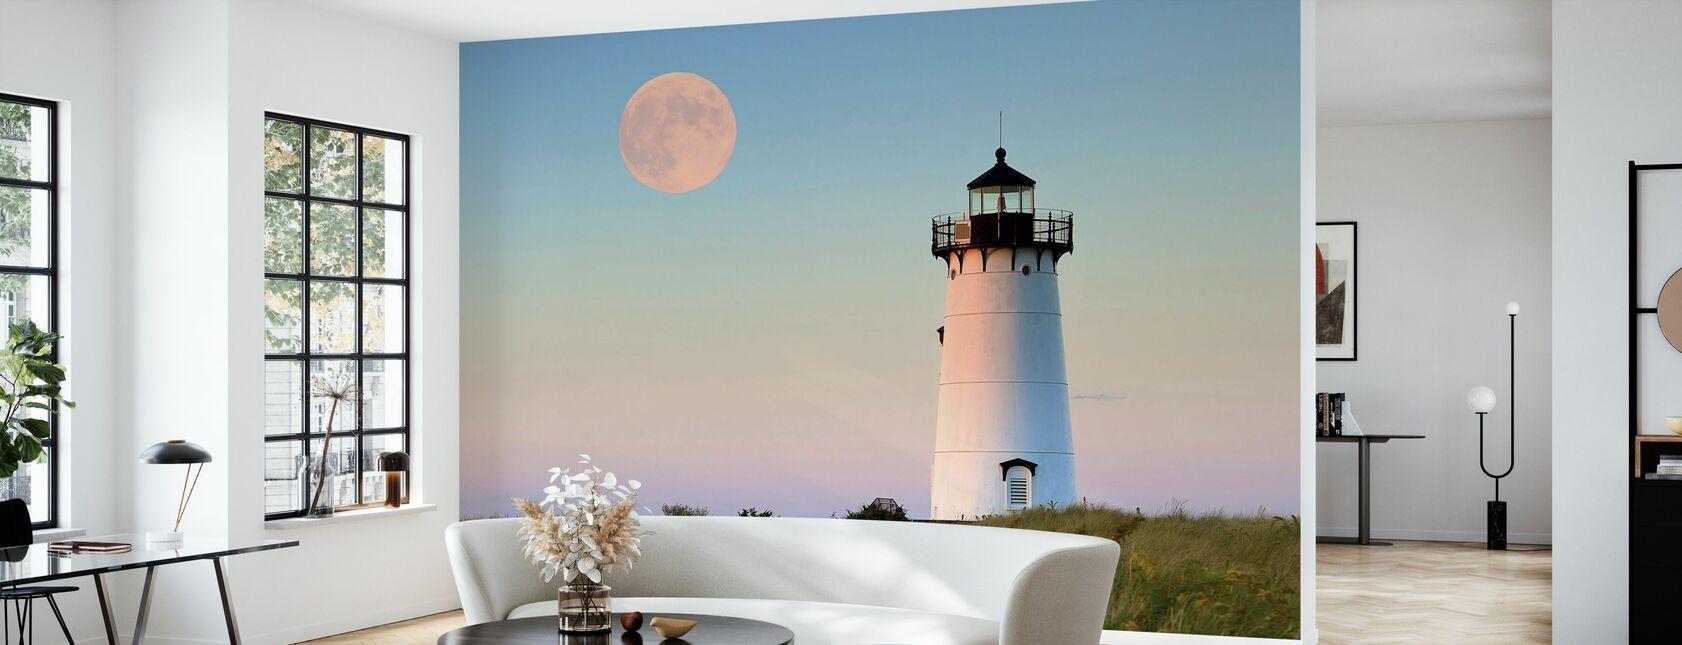 Moon Over Marthas Vineyard - Wallpaper - Living Room